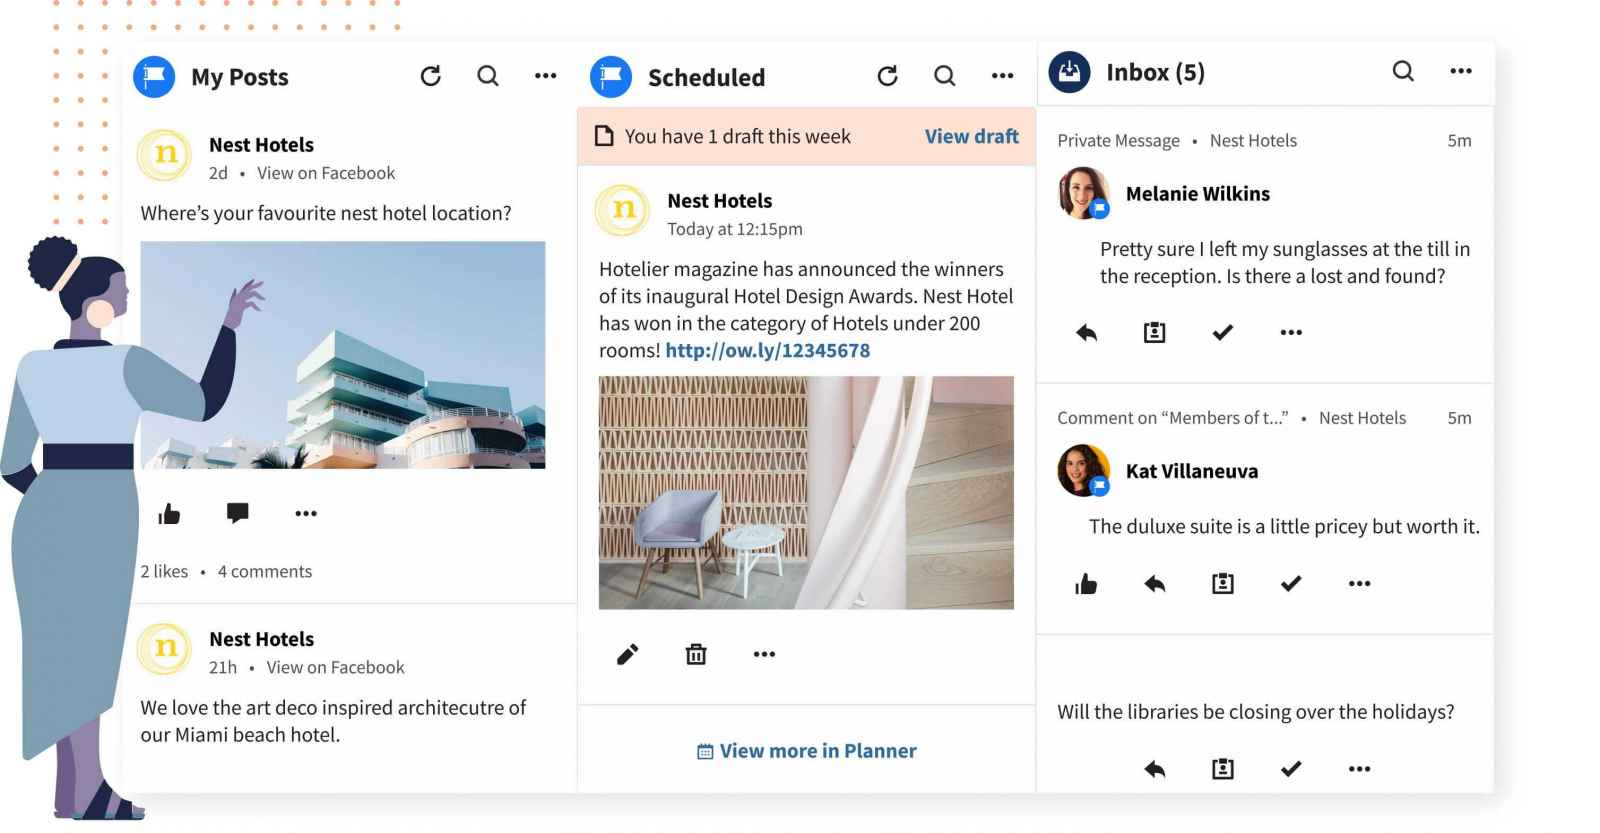 Hootsuite. Social Media Management Tools Comparison